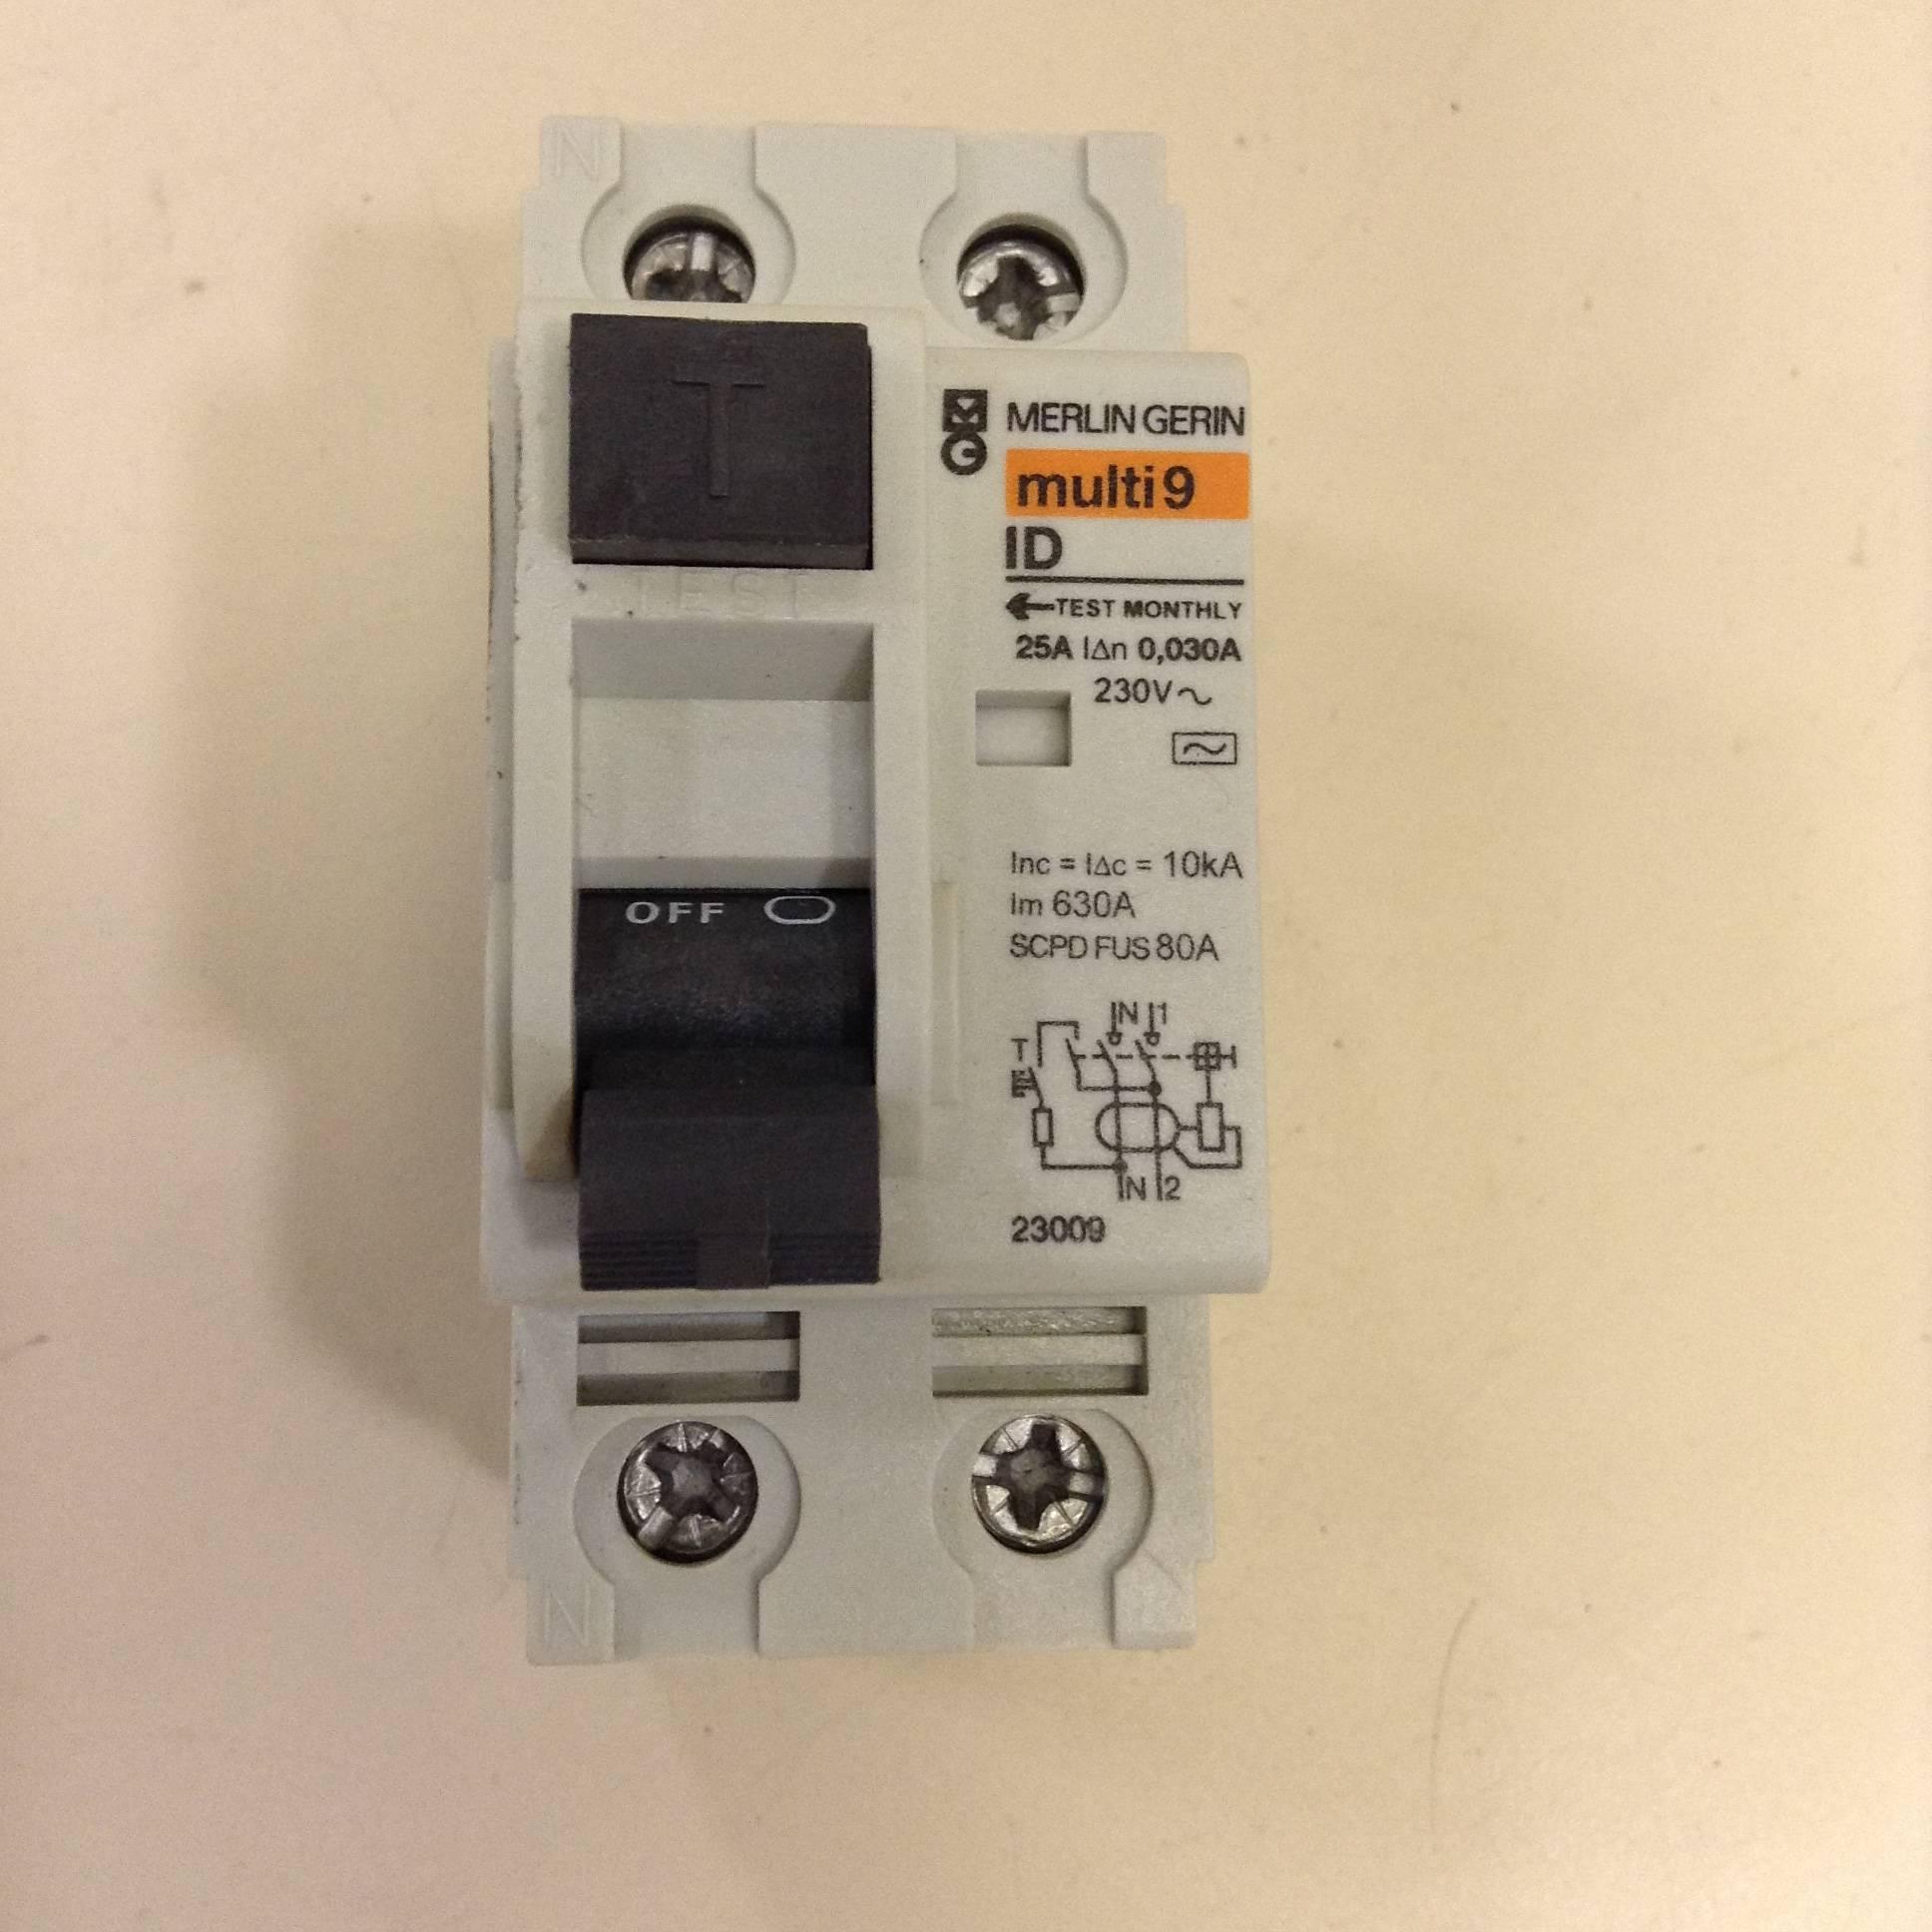 merlin gerin circuit breaker multi9 id 25a used 77918 ebay. Black Bedroom Furniture Sets. Home Design Ideas